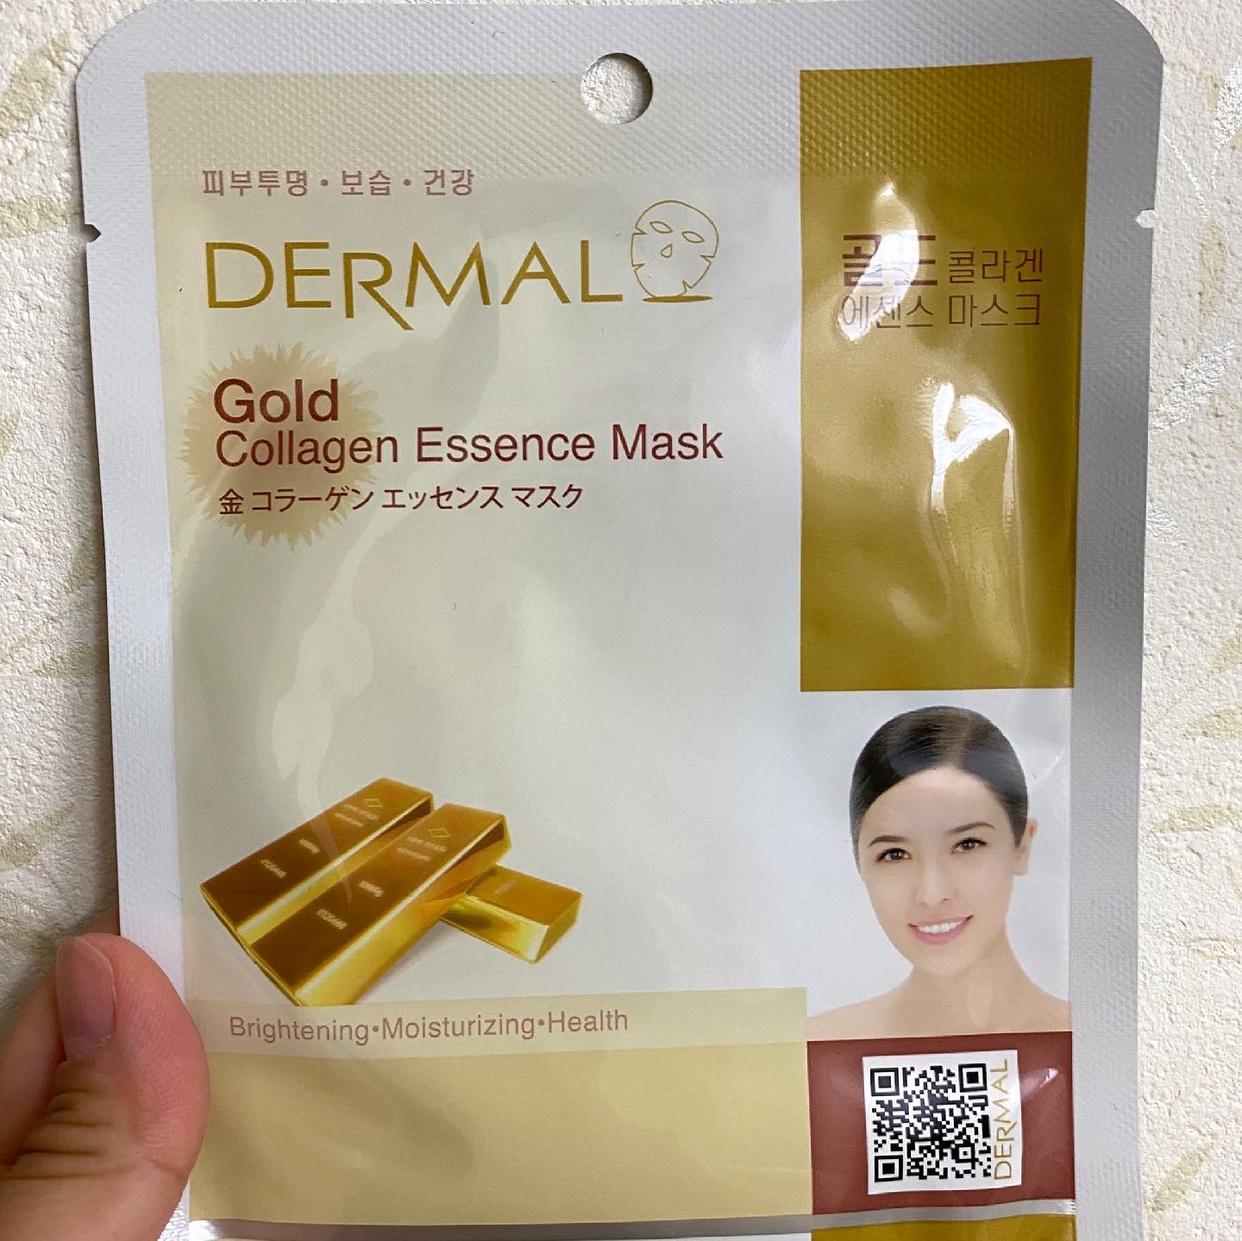 DERMAL(ダーマル) 金コラーゲン エッセンスマスクに関するのんびりのび子さんの口コミ画像2